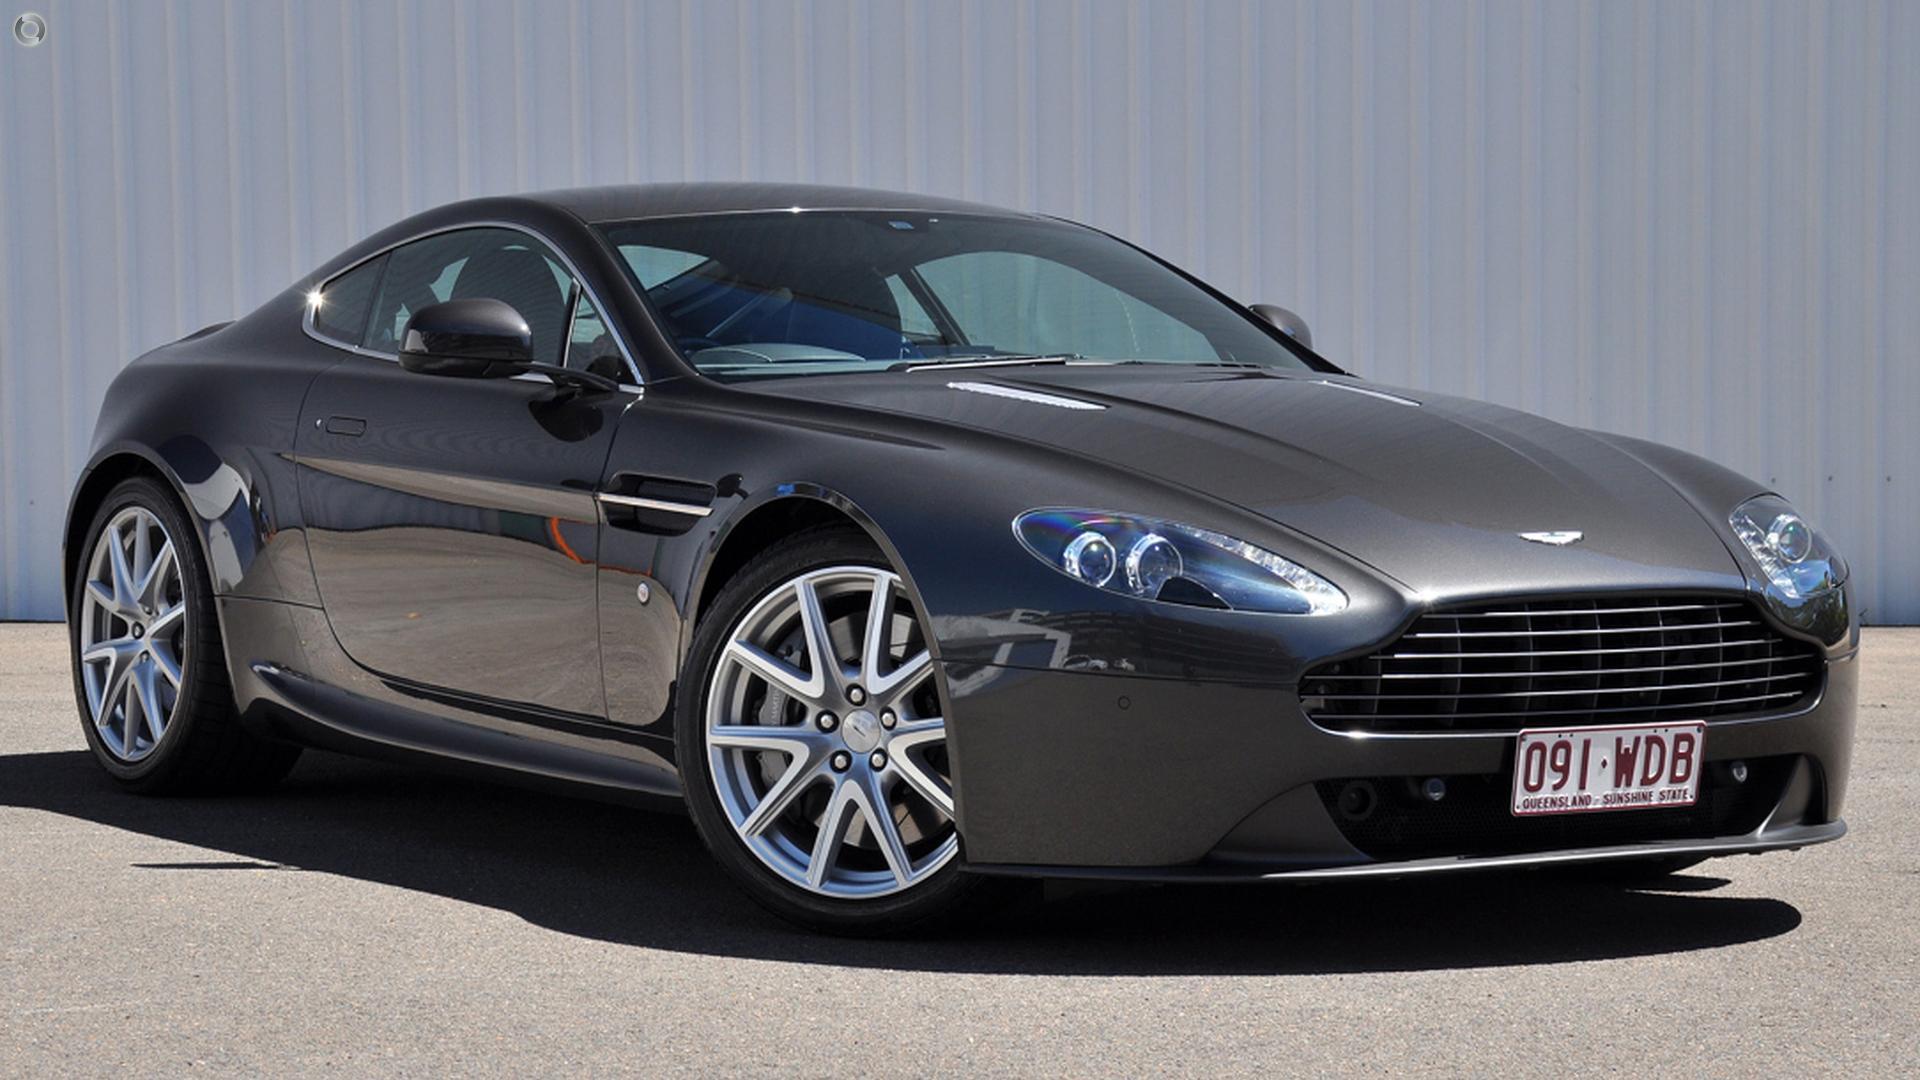 luxury car yards sydney  Tony Azzi Prestige